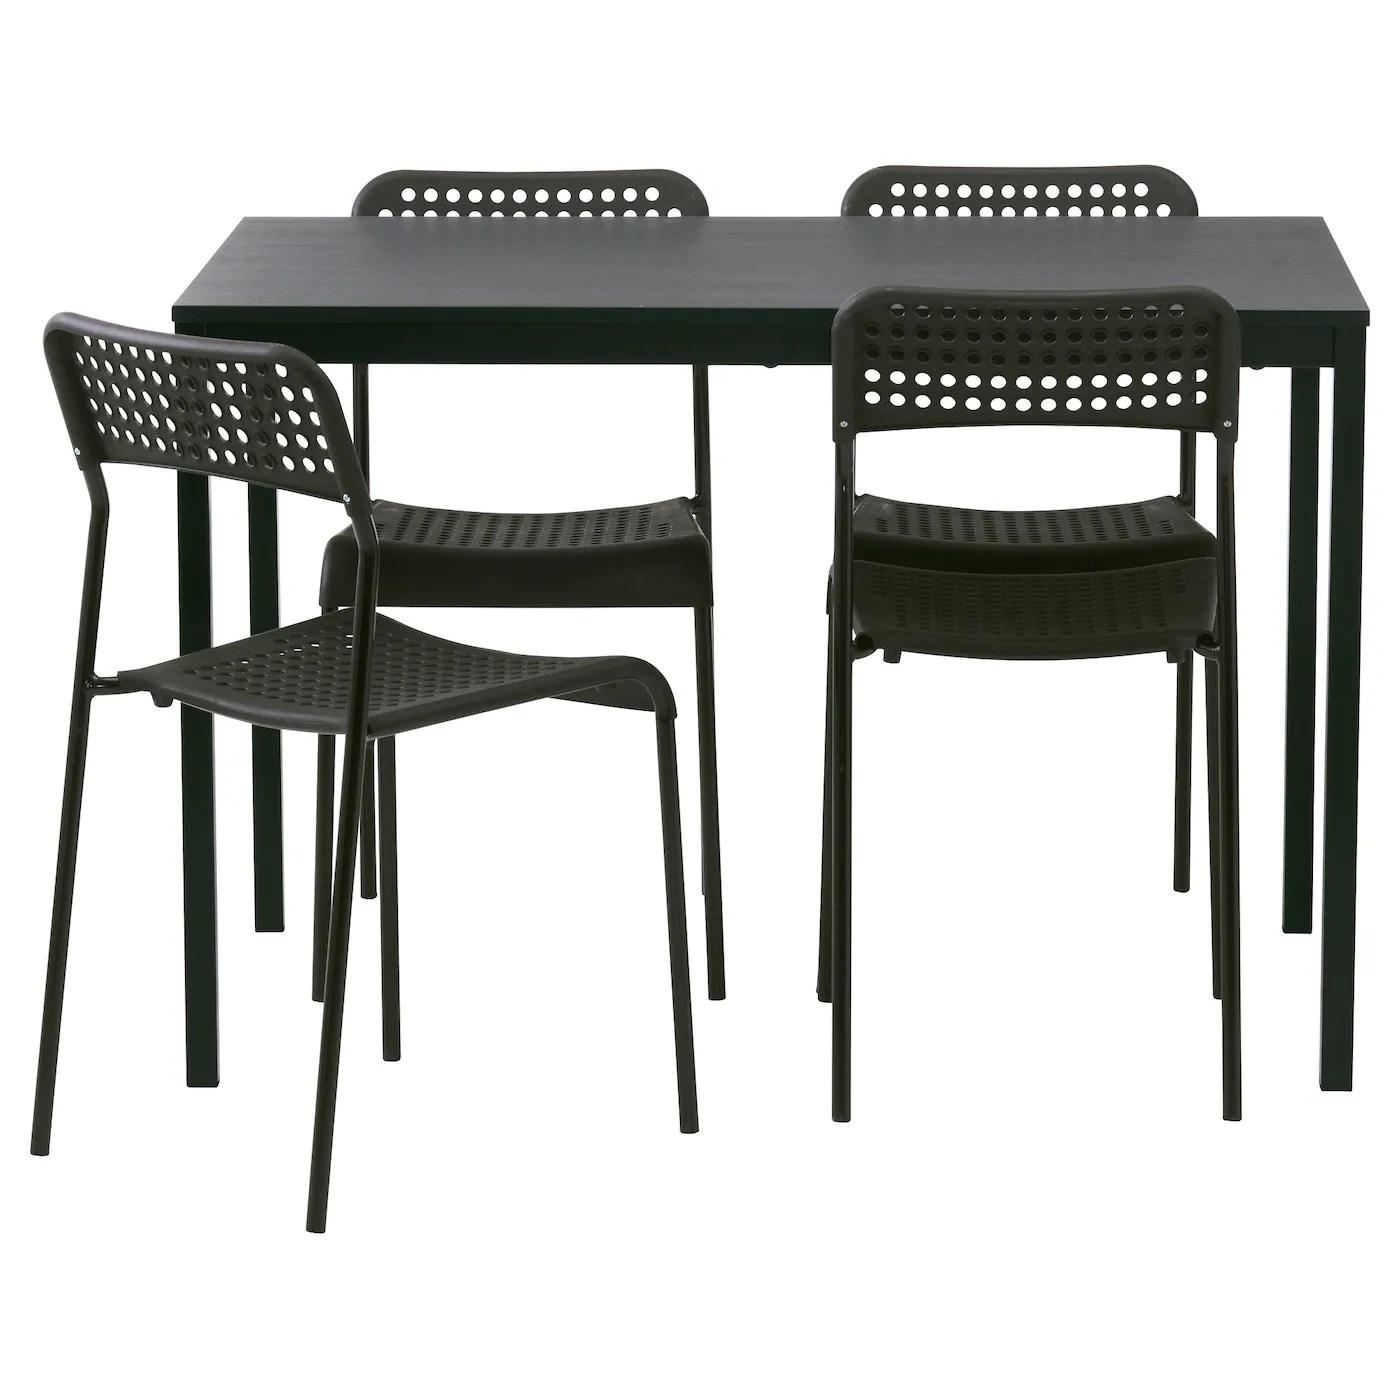 black table and chairs mesa chair a half glider tÄrendÖ adde 4 110 cm ikea